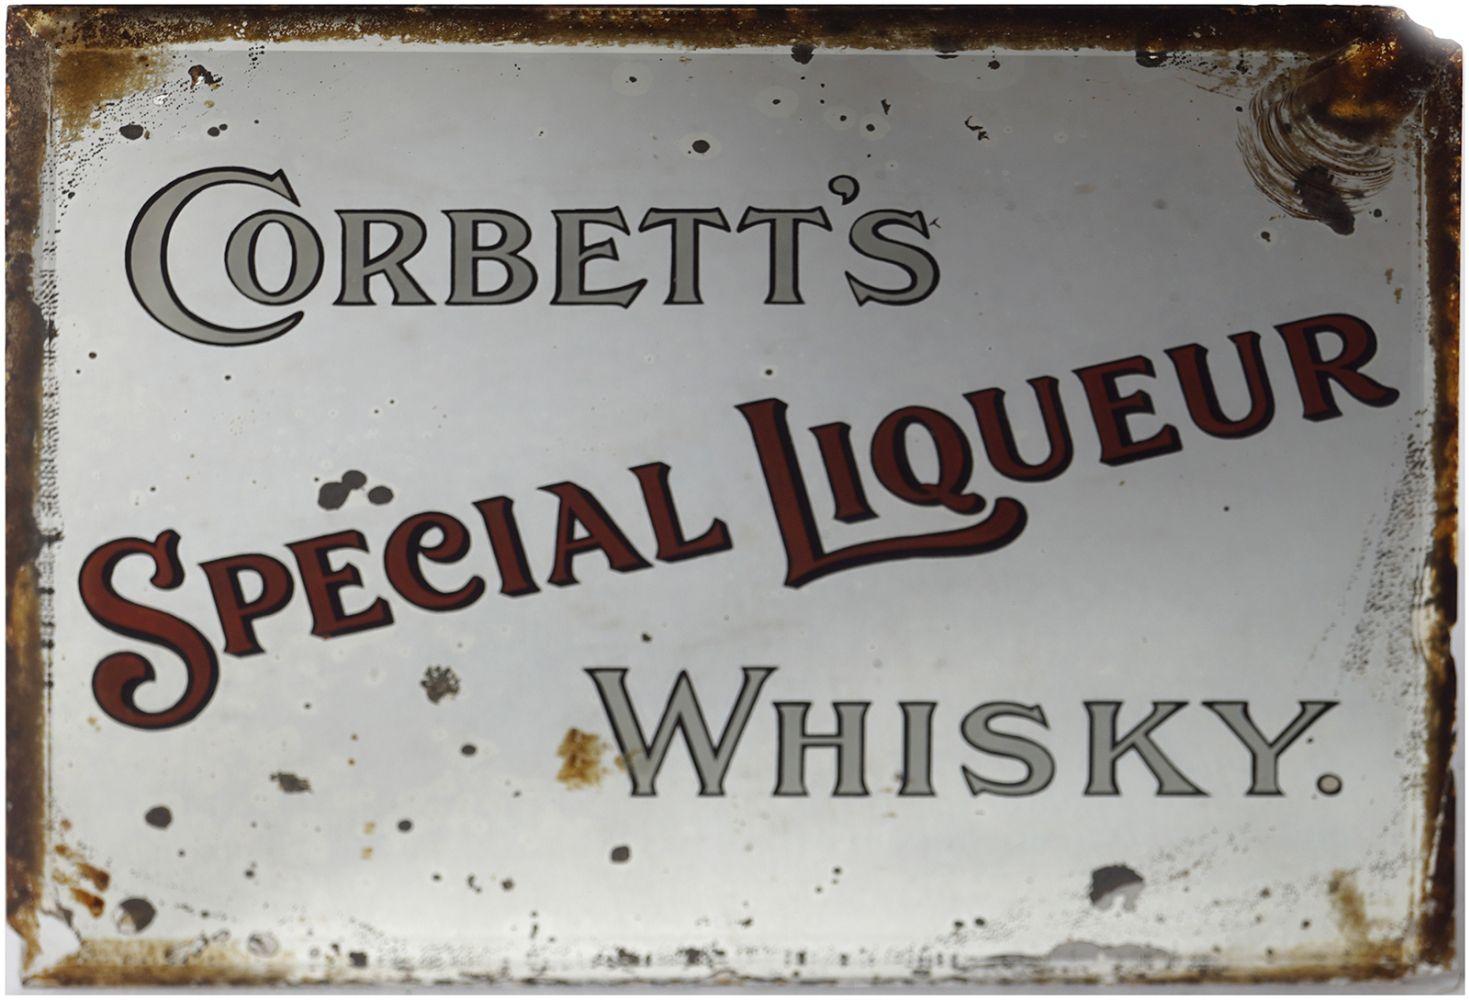 CORBETT'S SPECIAL LIQUEUR WHISKY ORIGINAL MIRROR